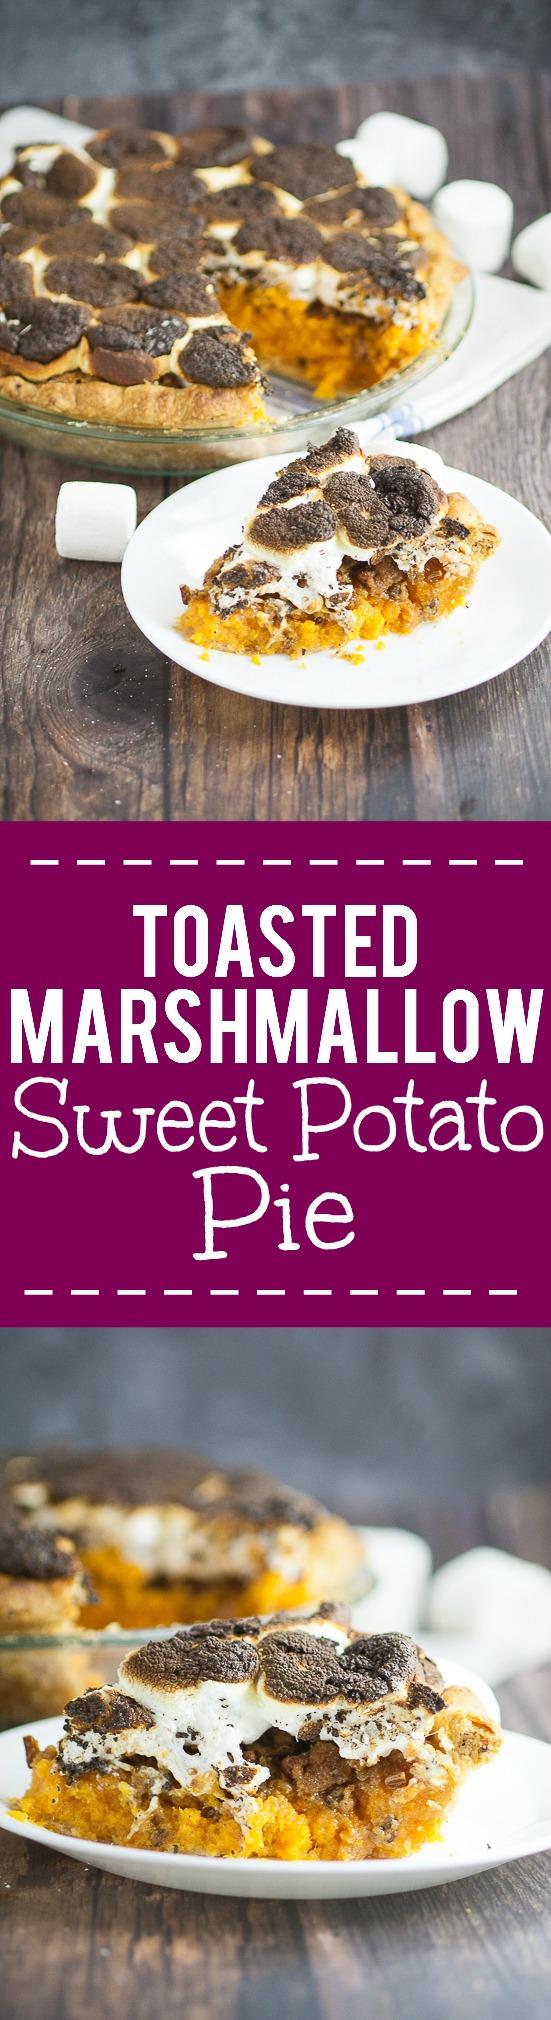 Toasted Marshmallow Sweet Potato Pie Recipe -Toasted Marshmallow Sweet Potato Pie recipe with golden toasted marshmallows and sweet potatoes in a flaky crust. A classic sweet potato pie recipe with a gooey, sweet, marshmallow twist! This looks so yummy for Thanksgiving! Perfect easy Thanksgiving dessert recipe!